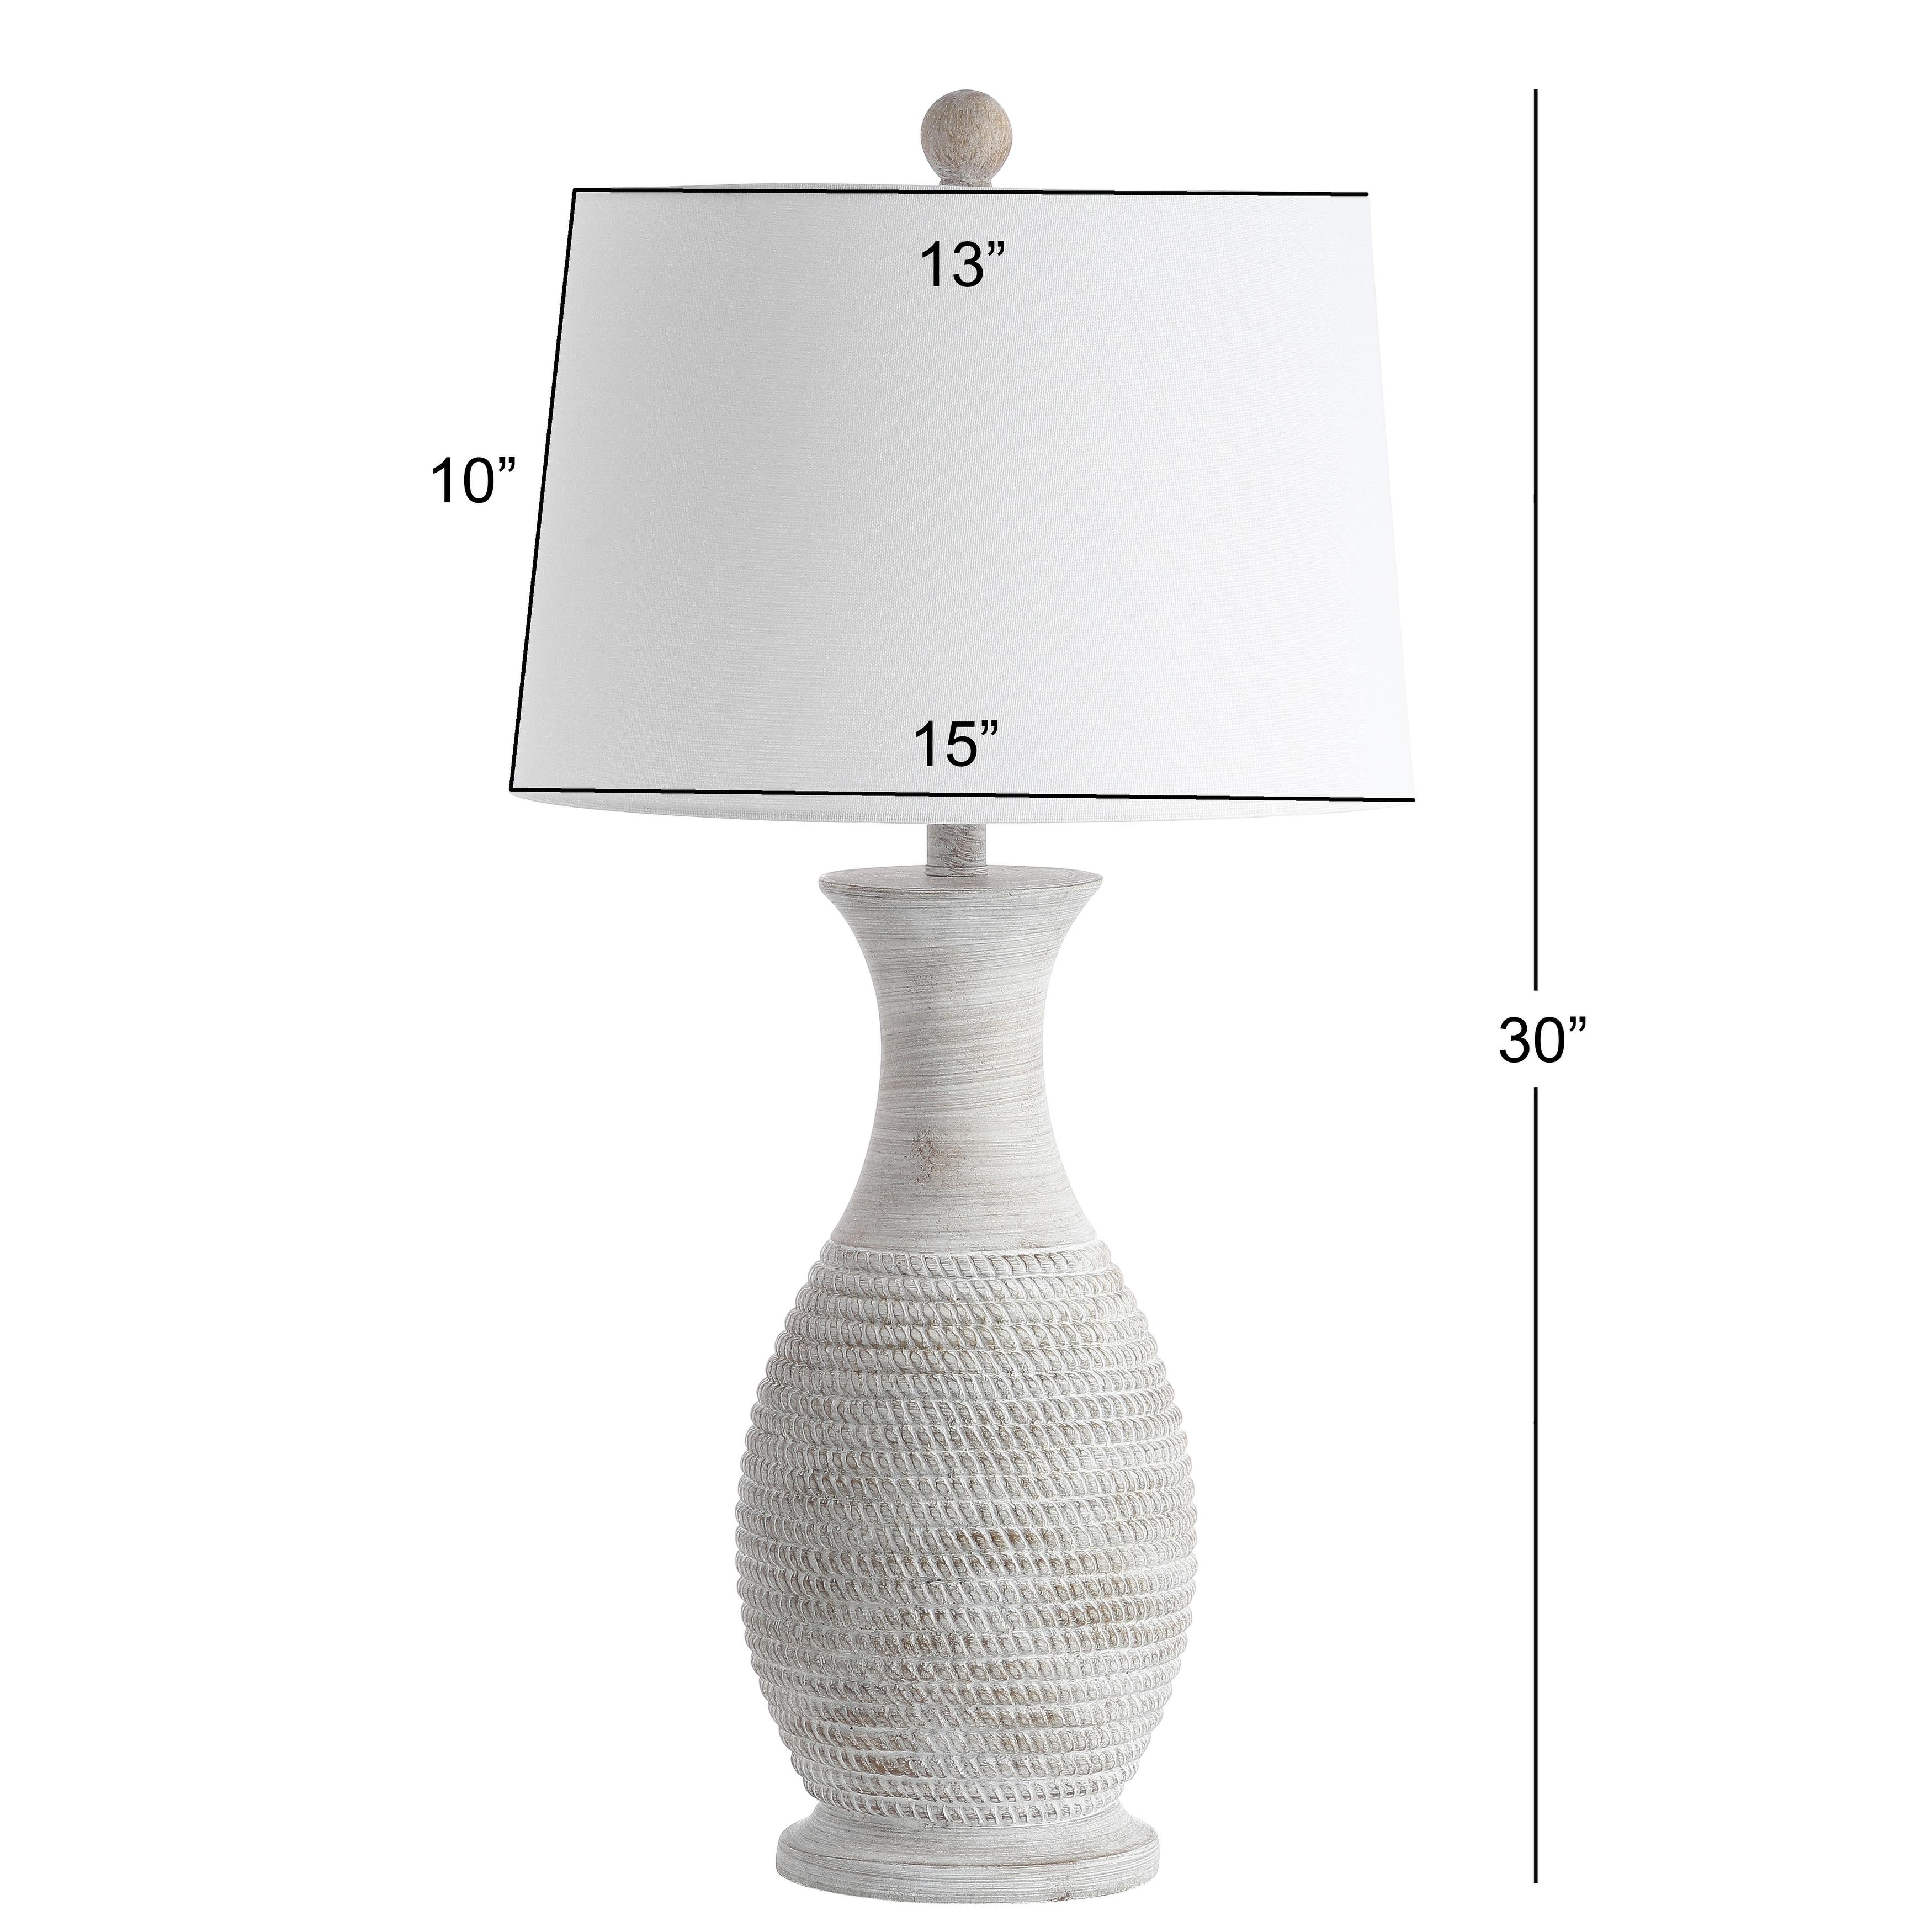 Safavieh Lighting 30 Inch Bentlee Grey Led Table Lamp Set Of 2 15 X15 X30 On Sale Overstock 27123744